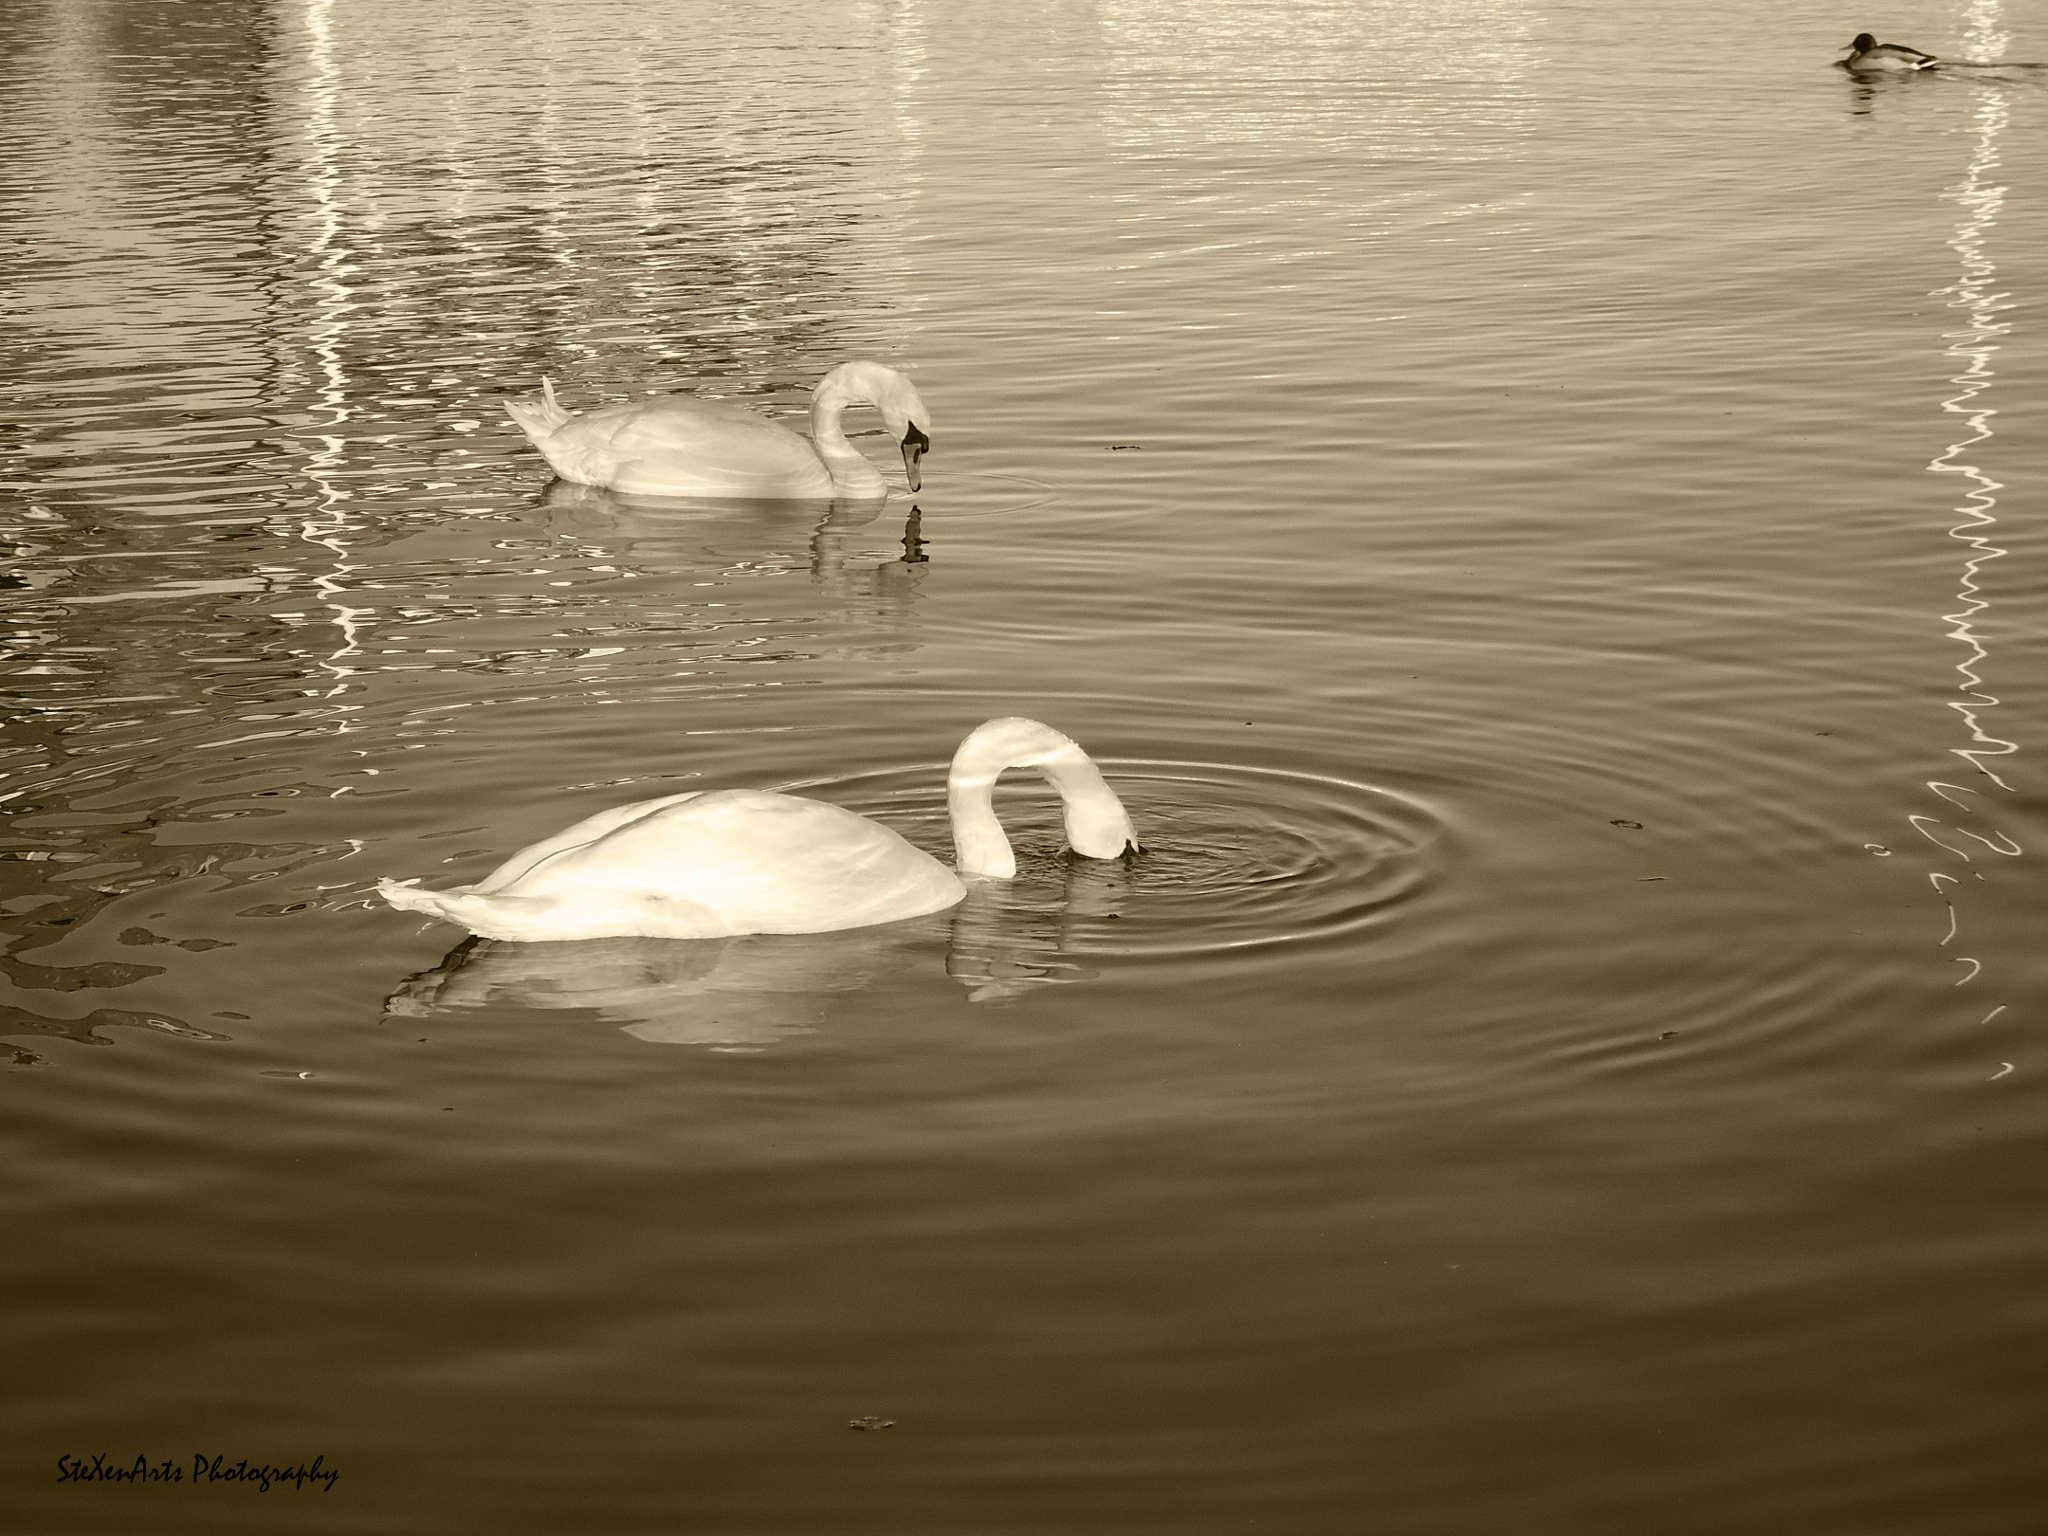 swan lake 2 by Sanna